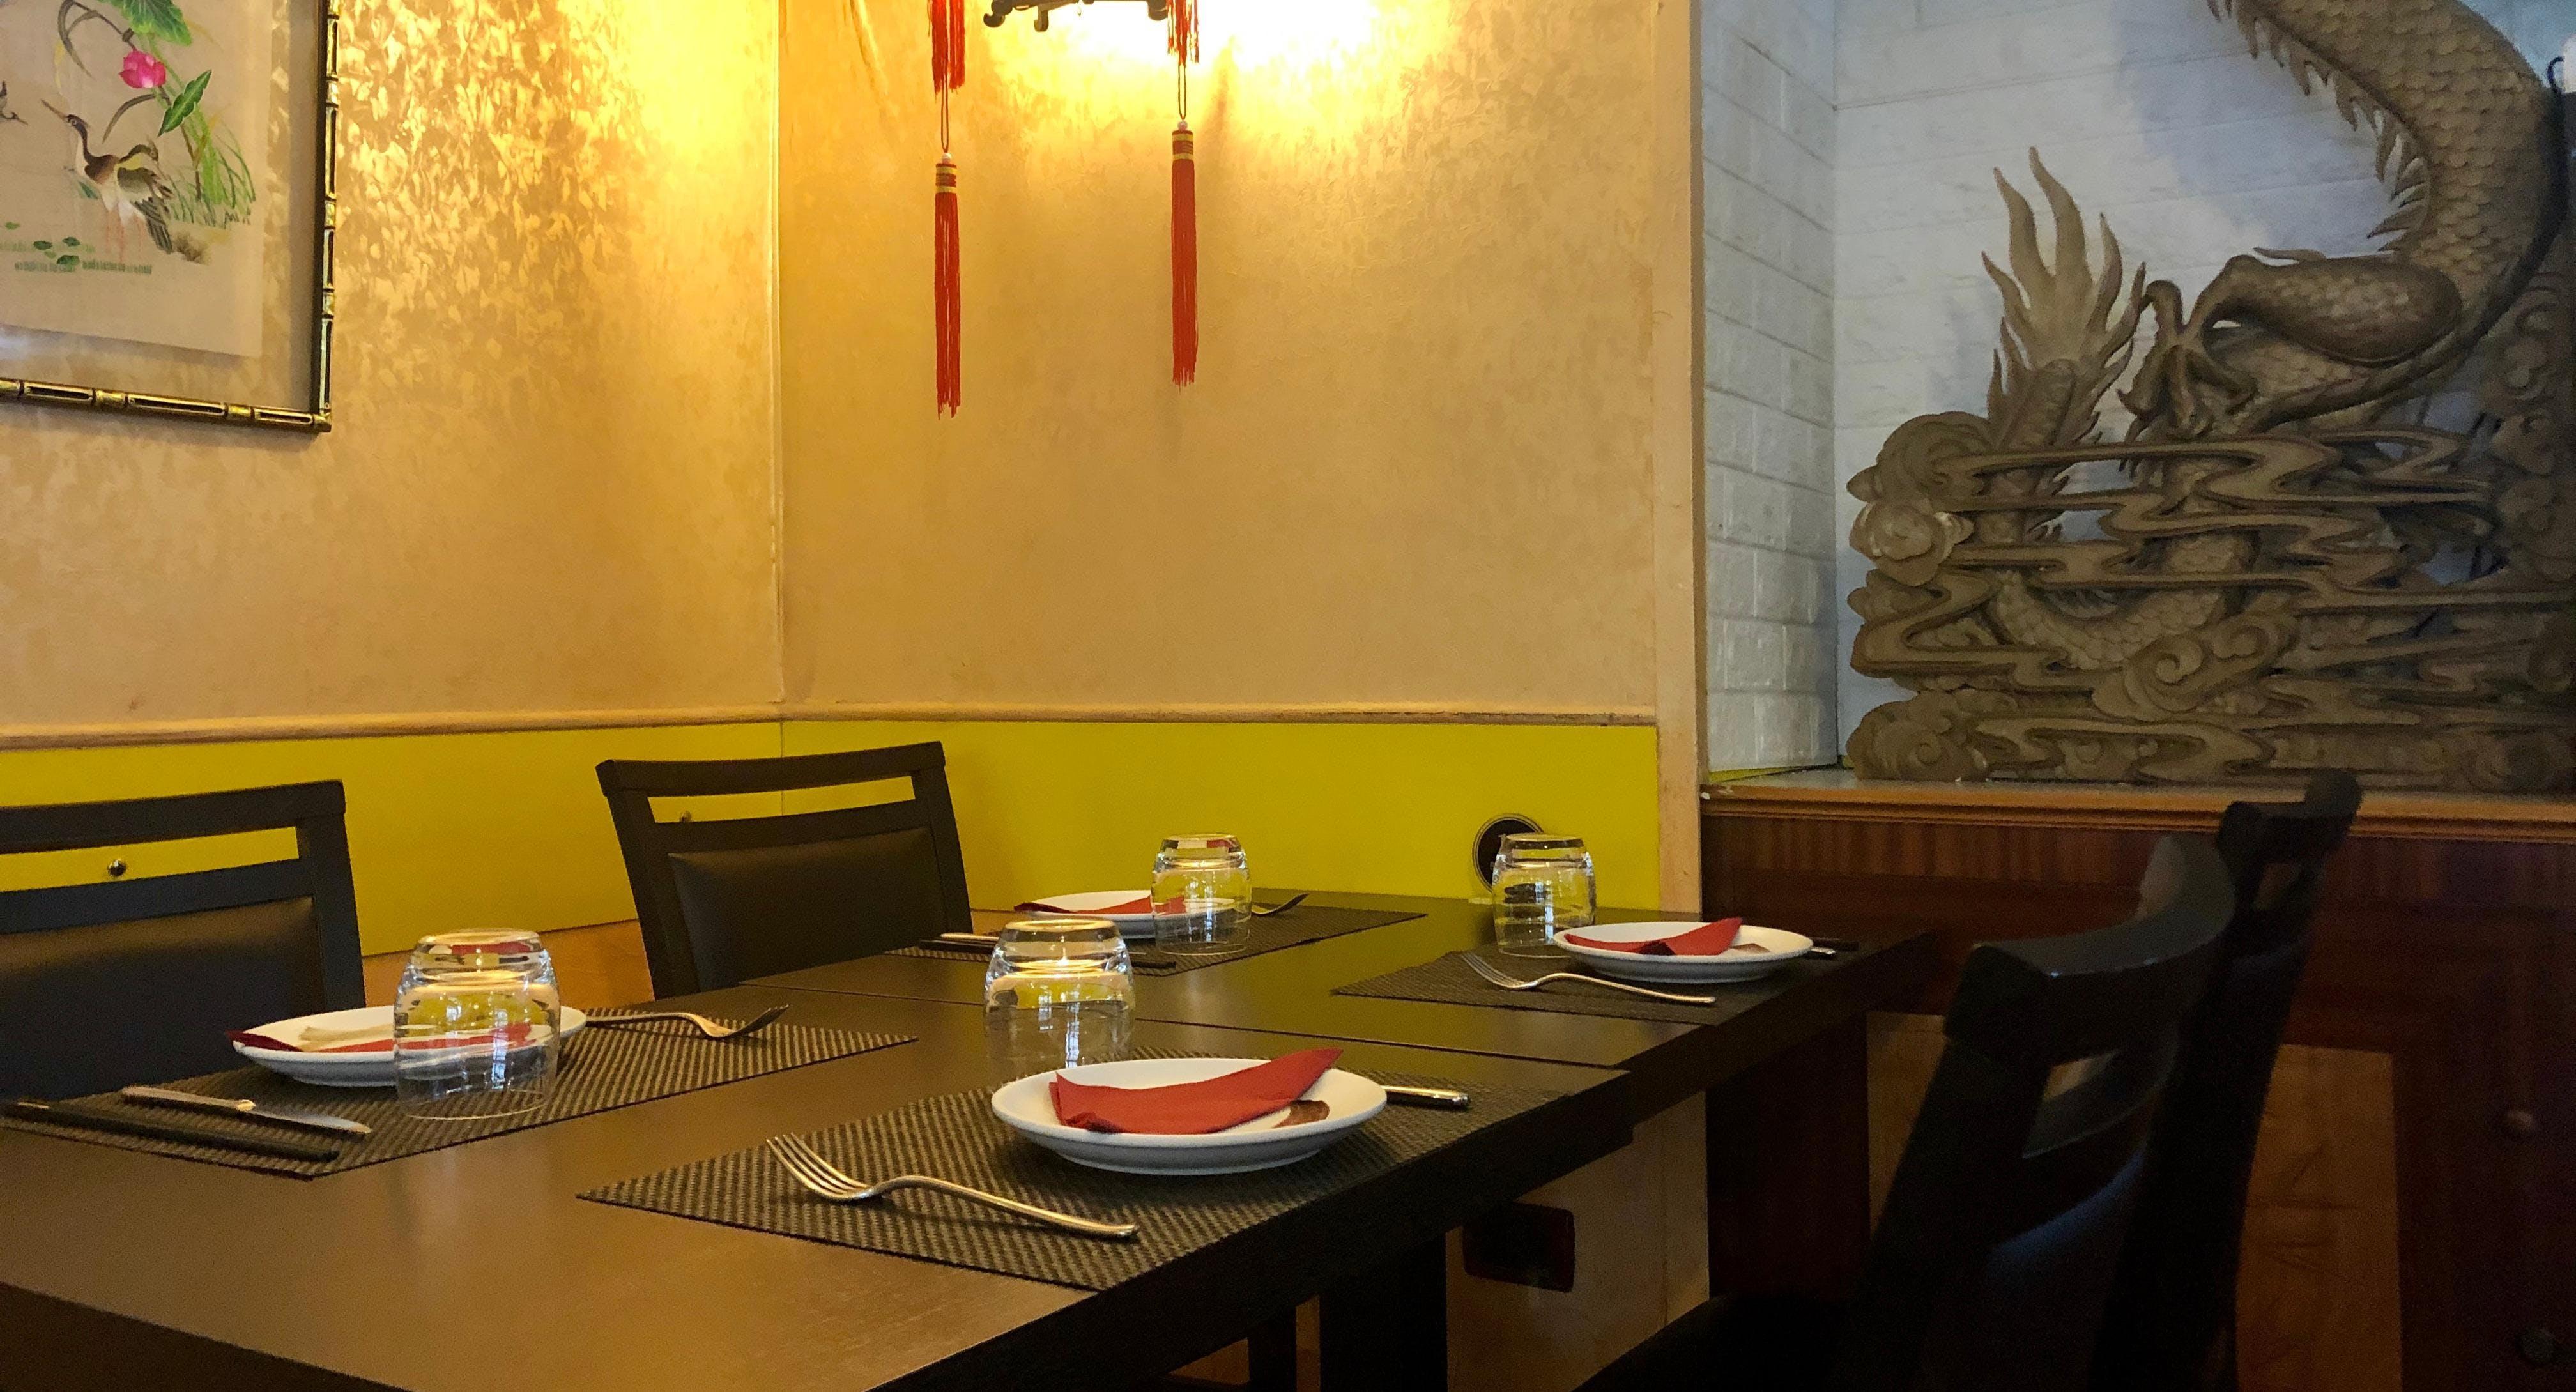 HongKong Palermo Ristorante Cinese & Giapponese